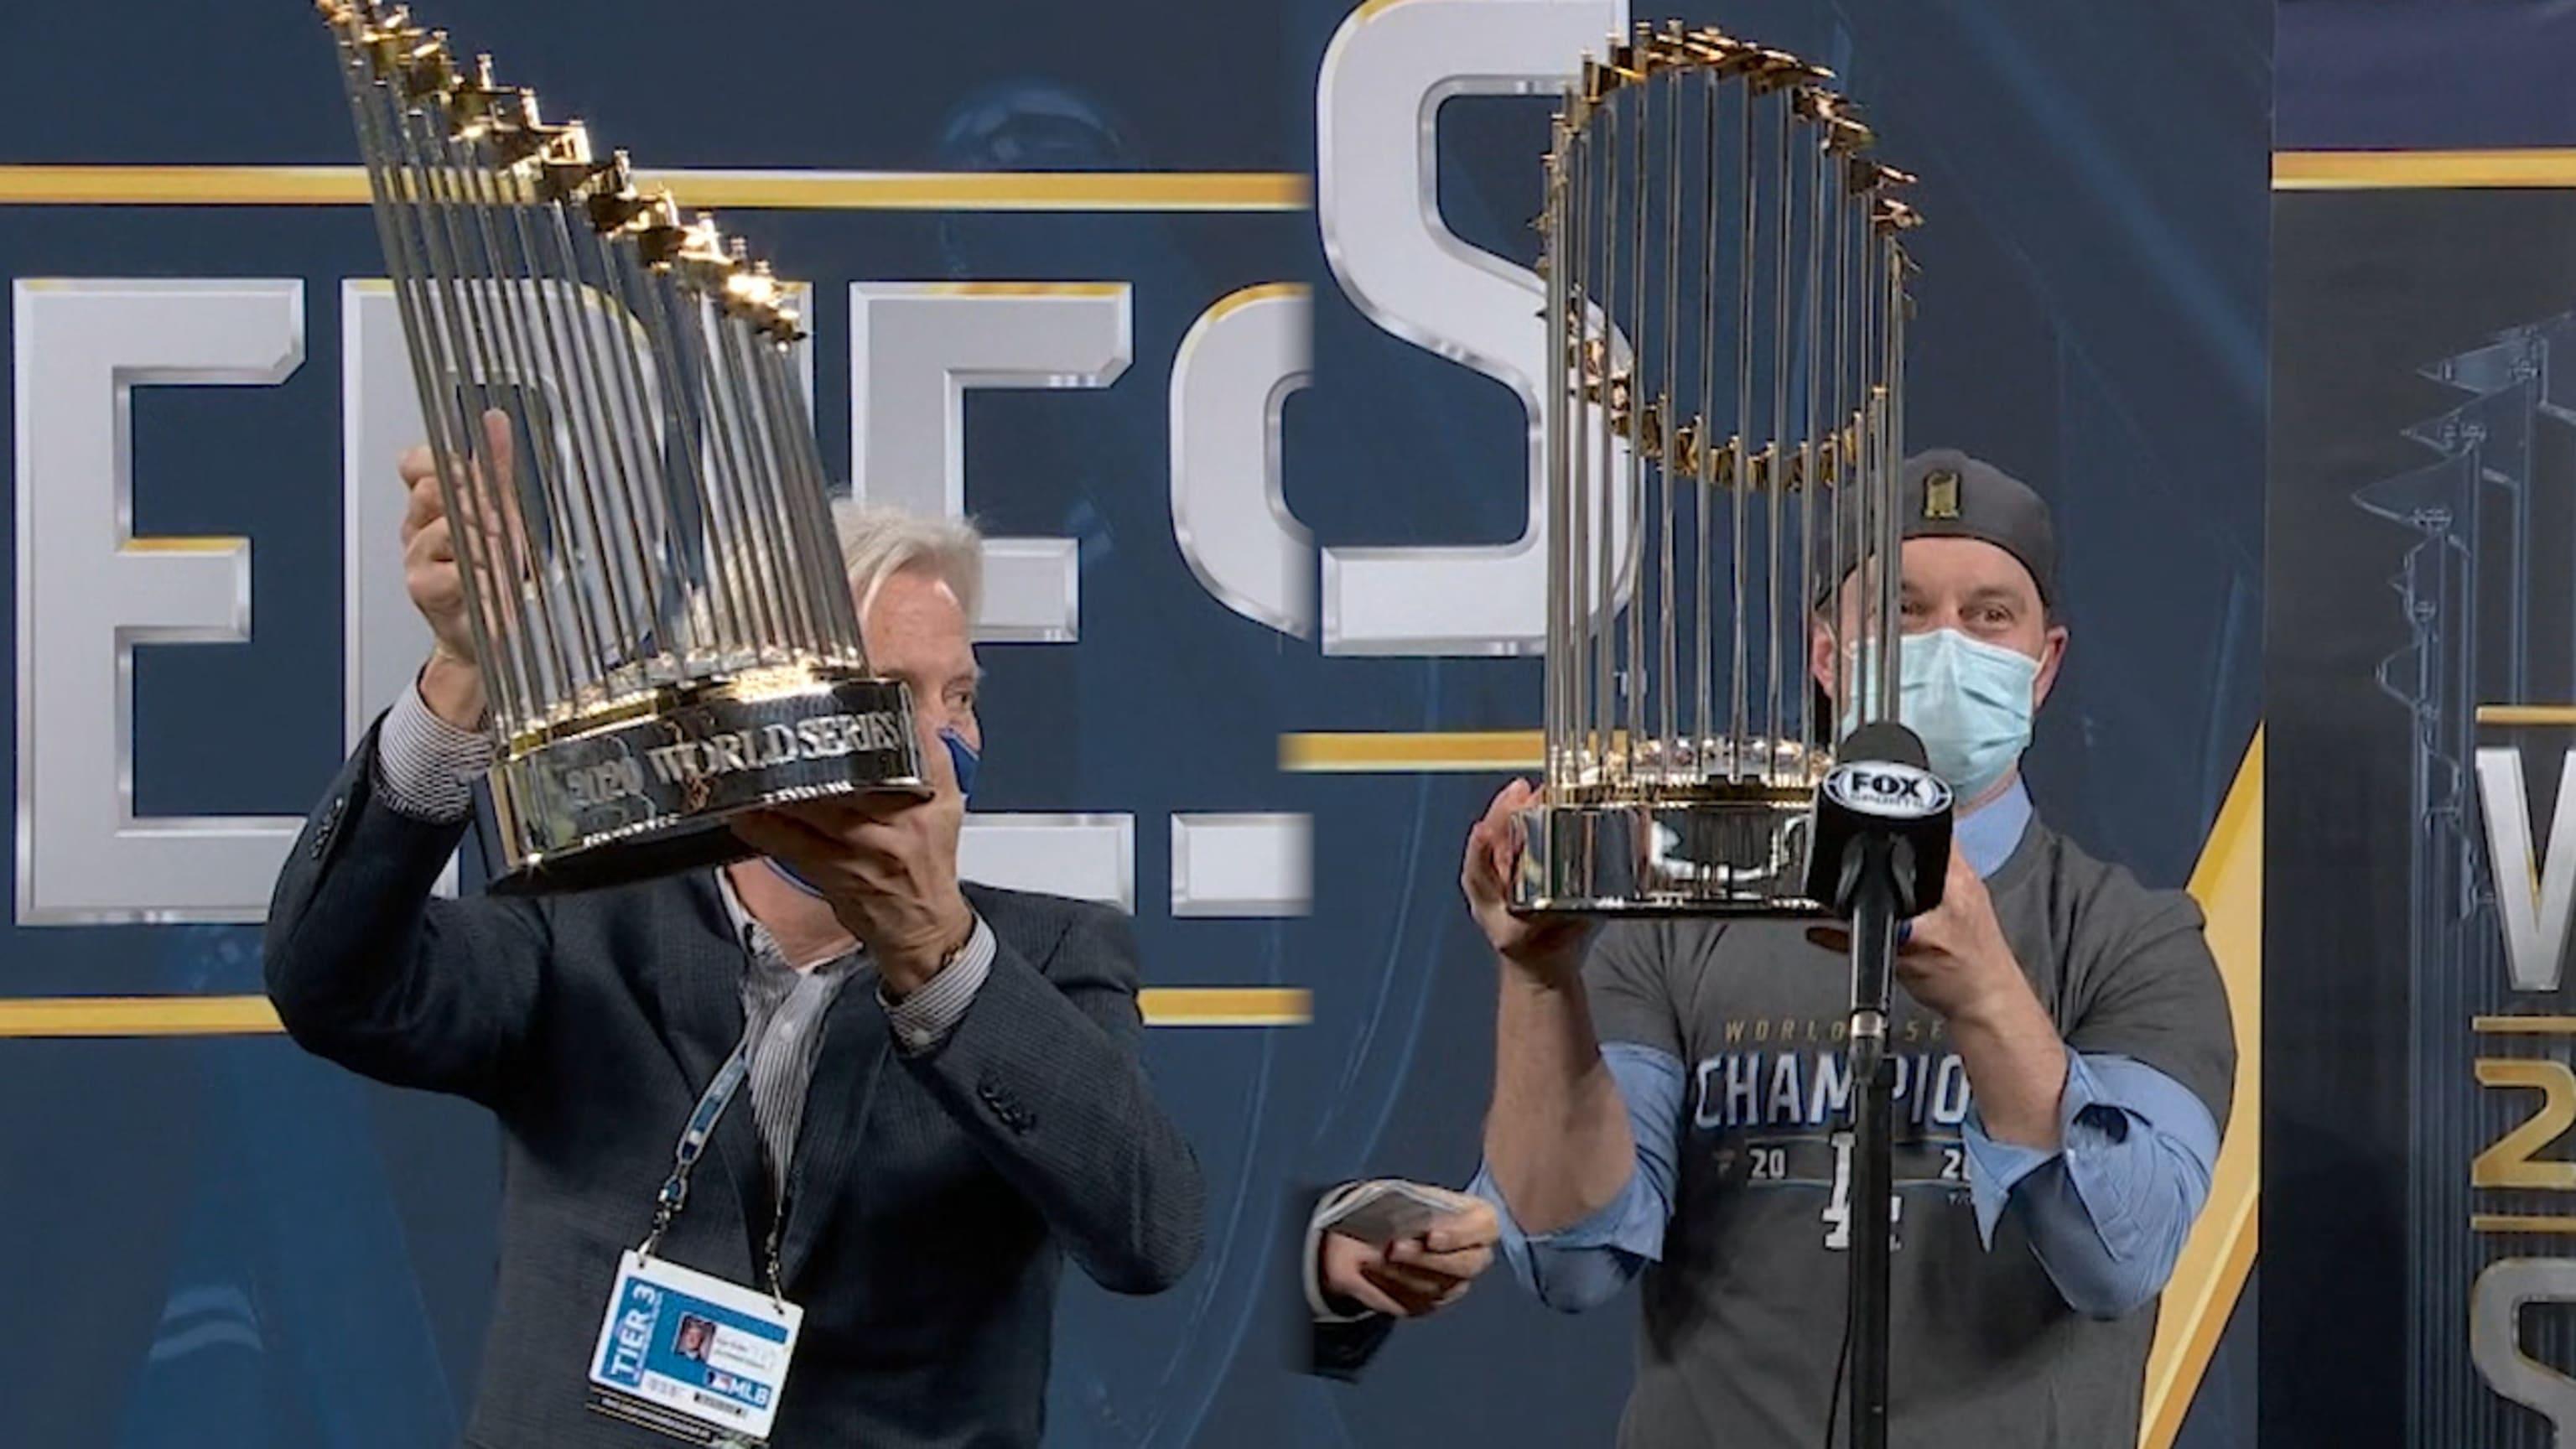 Dodgers accept 2020 WS trophy